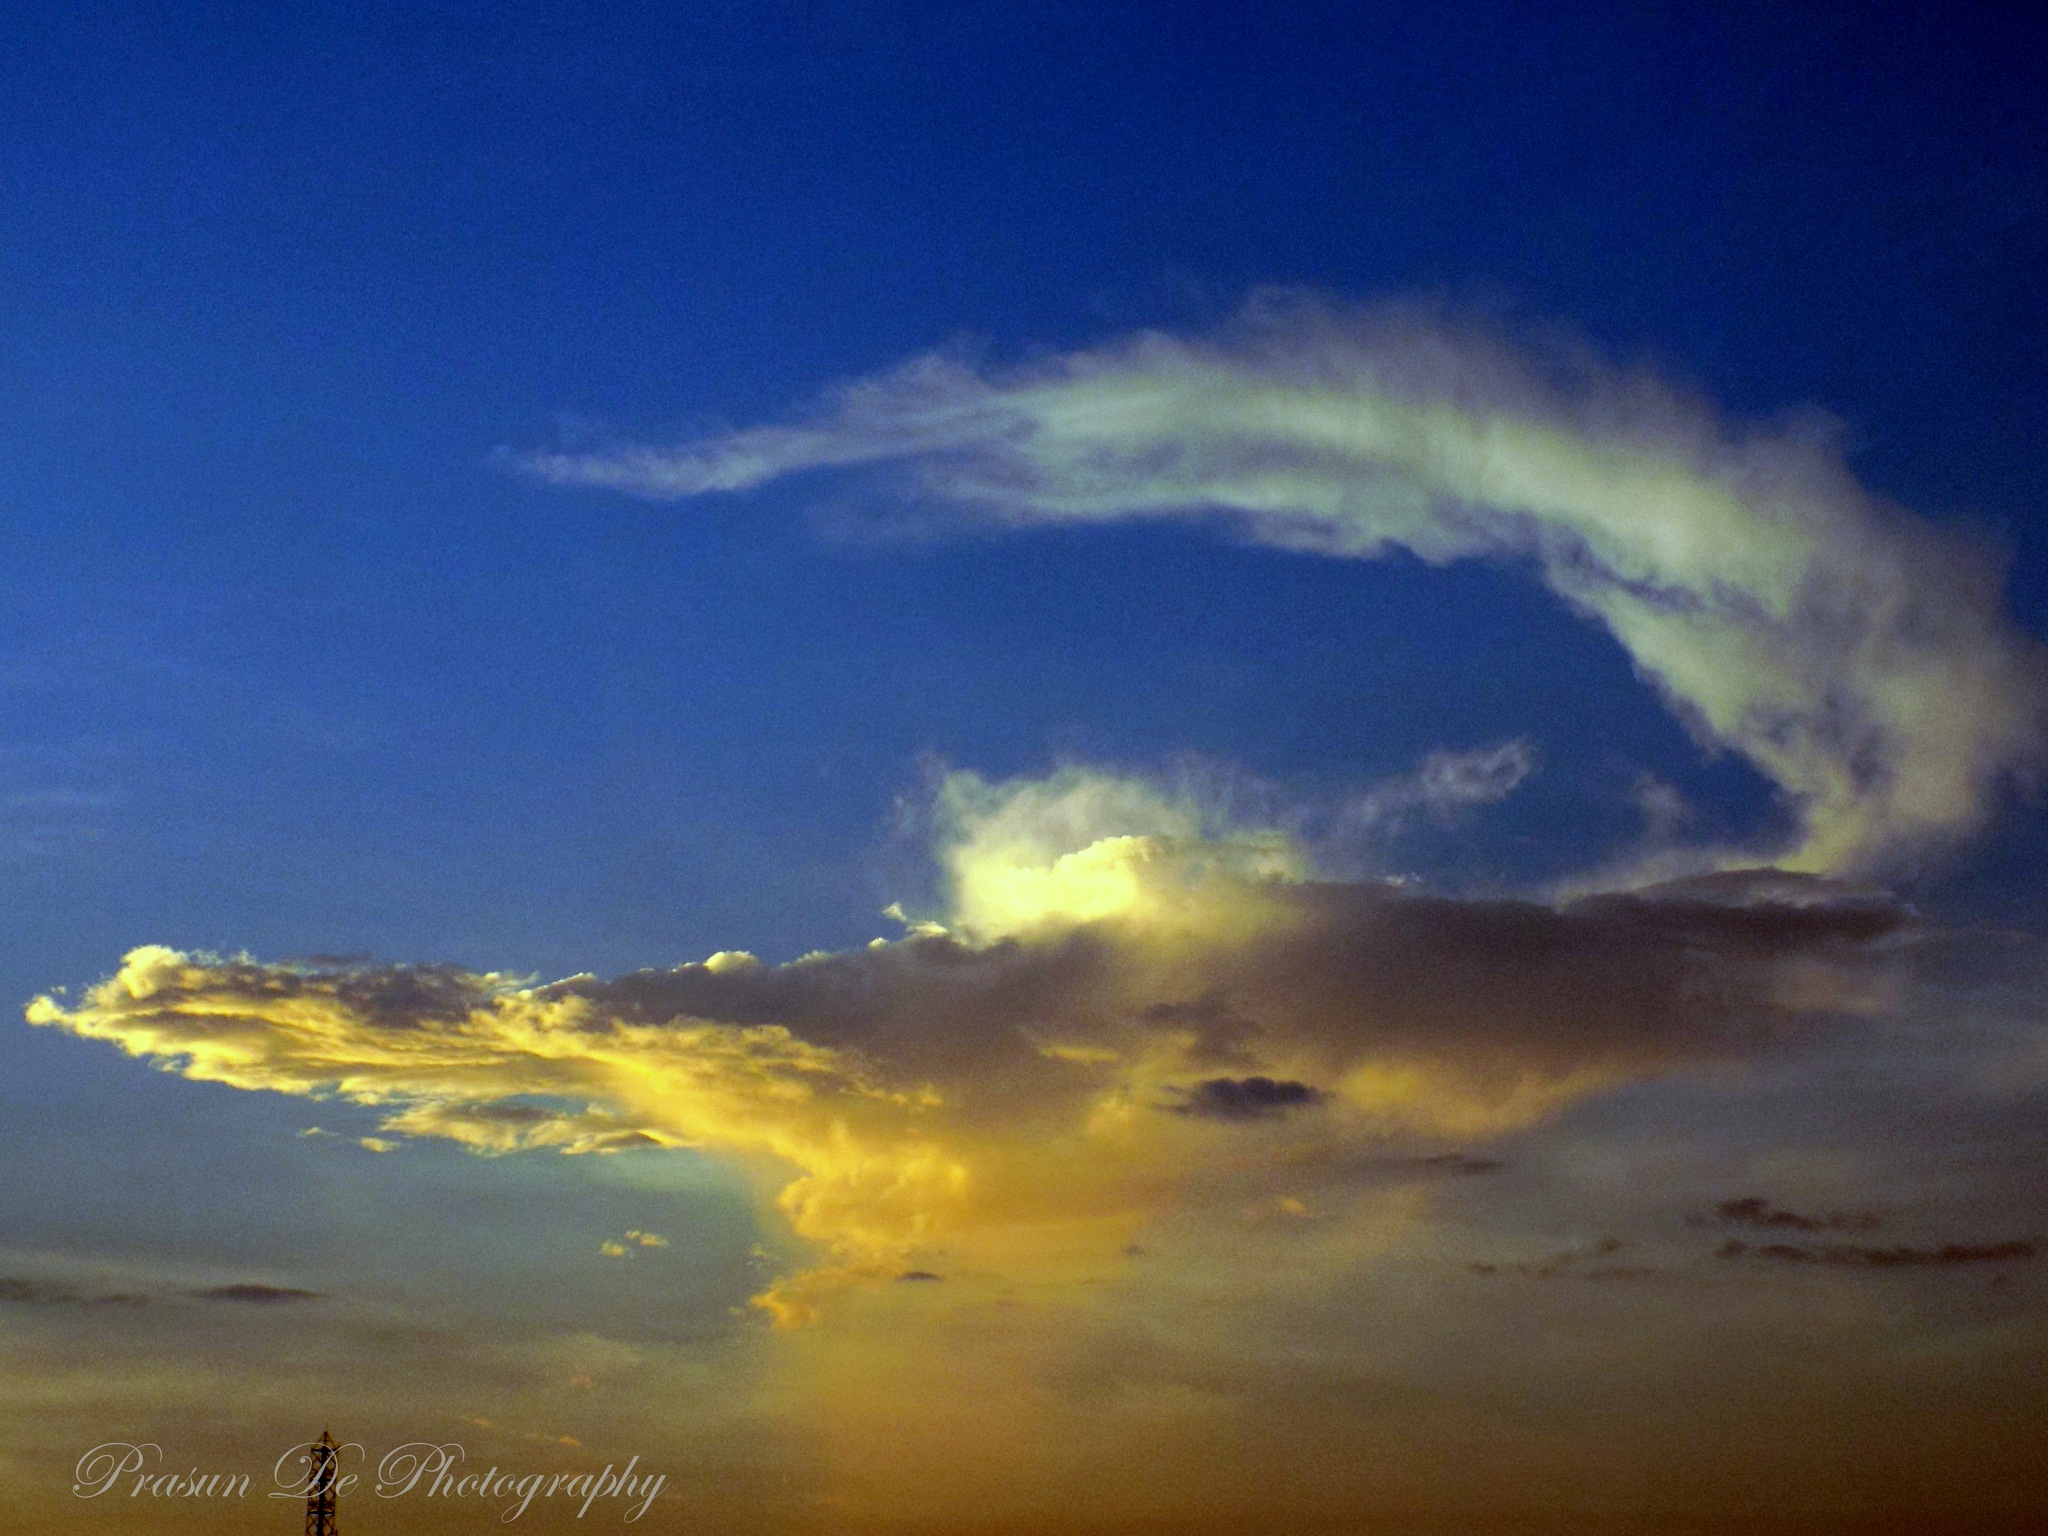 Aladin's Magic Lamp on the sky by Prasun De